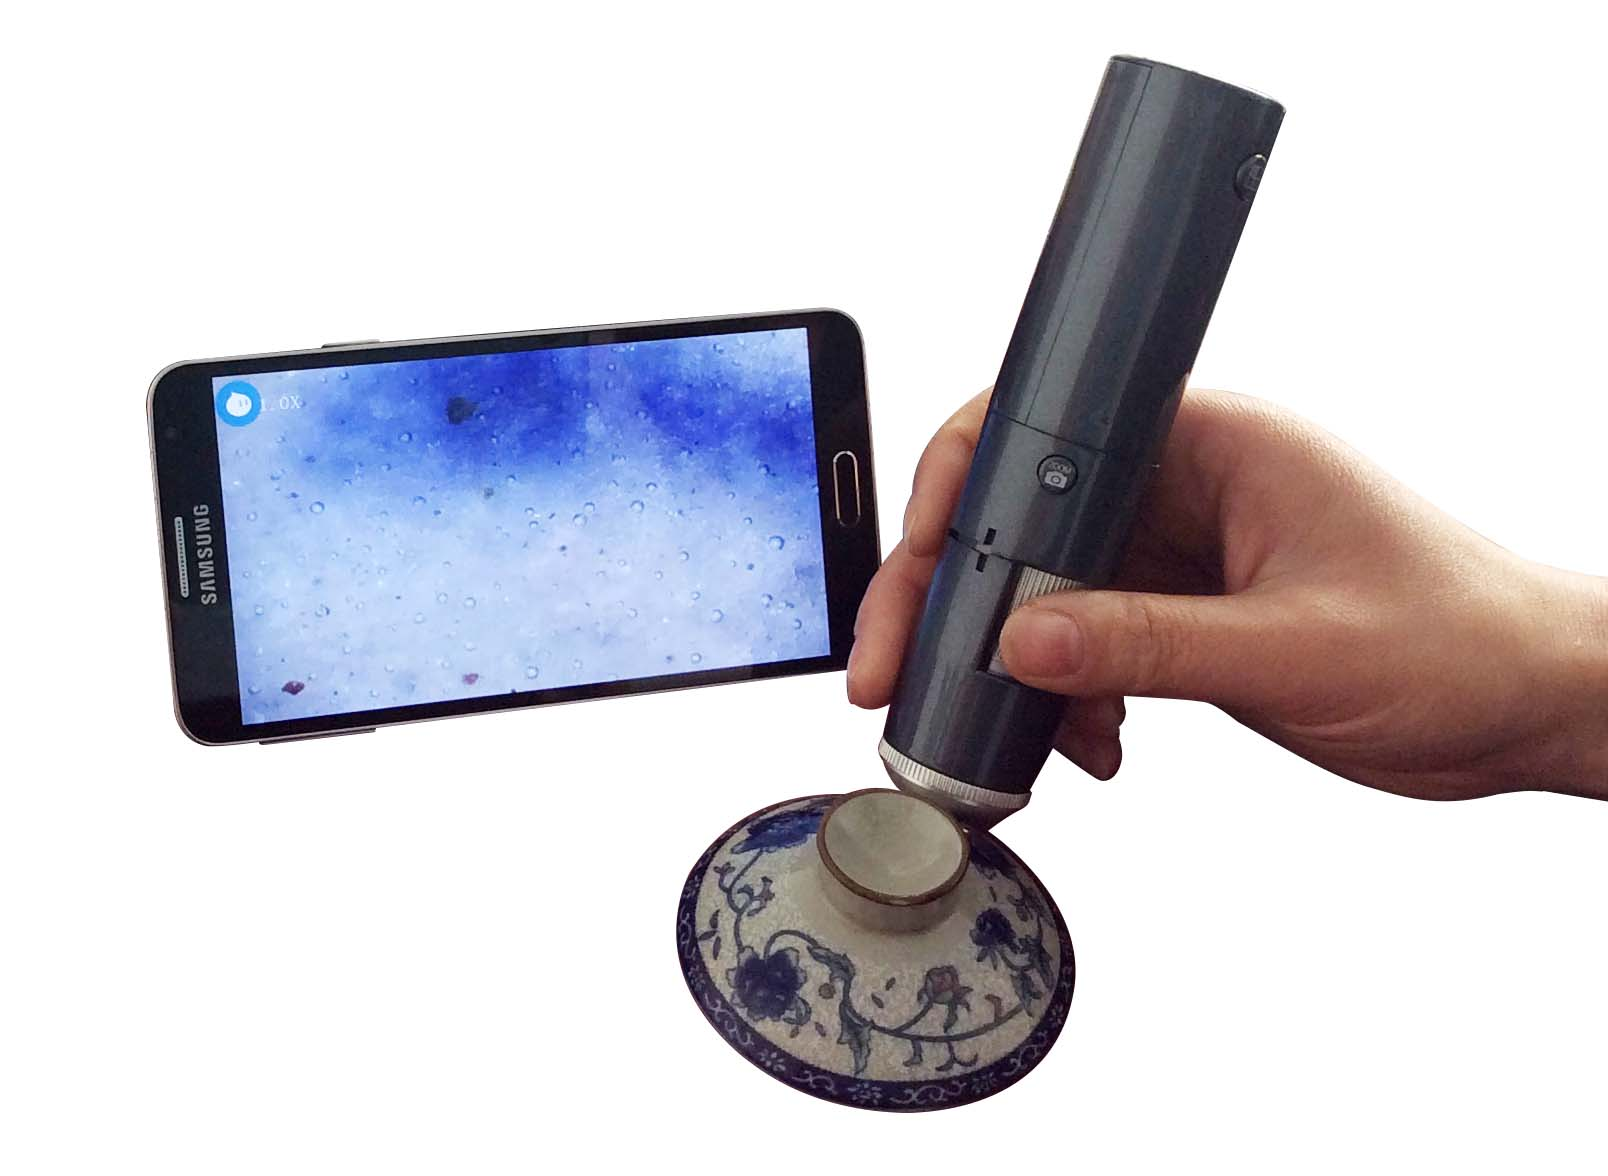 Wireless digital microscope, wireless access phone Tablet PC